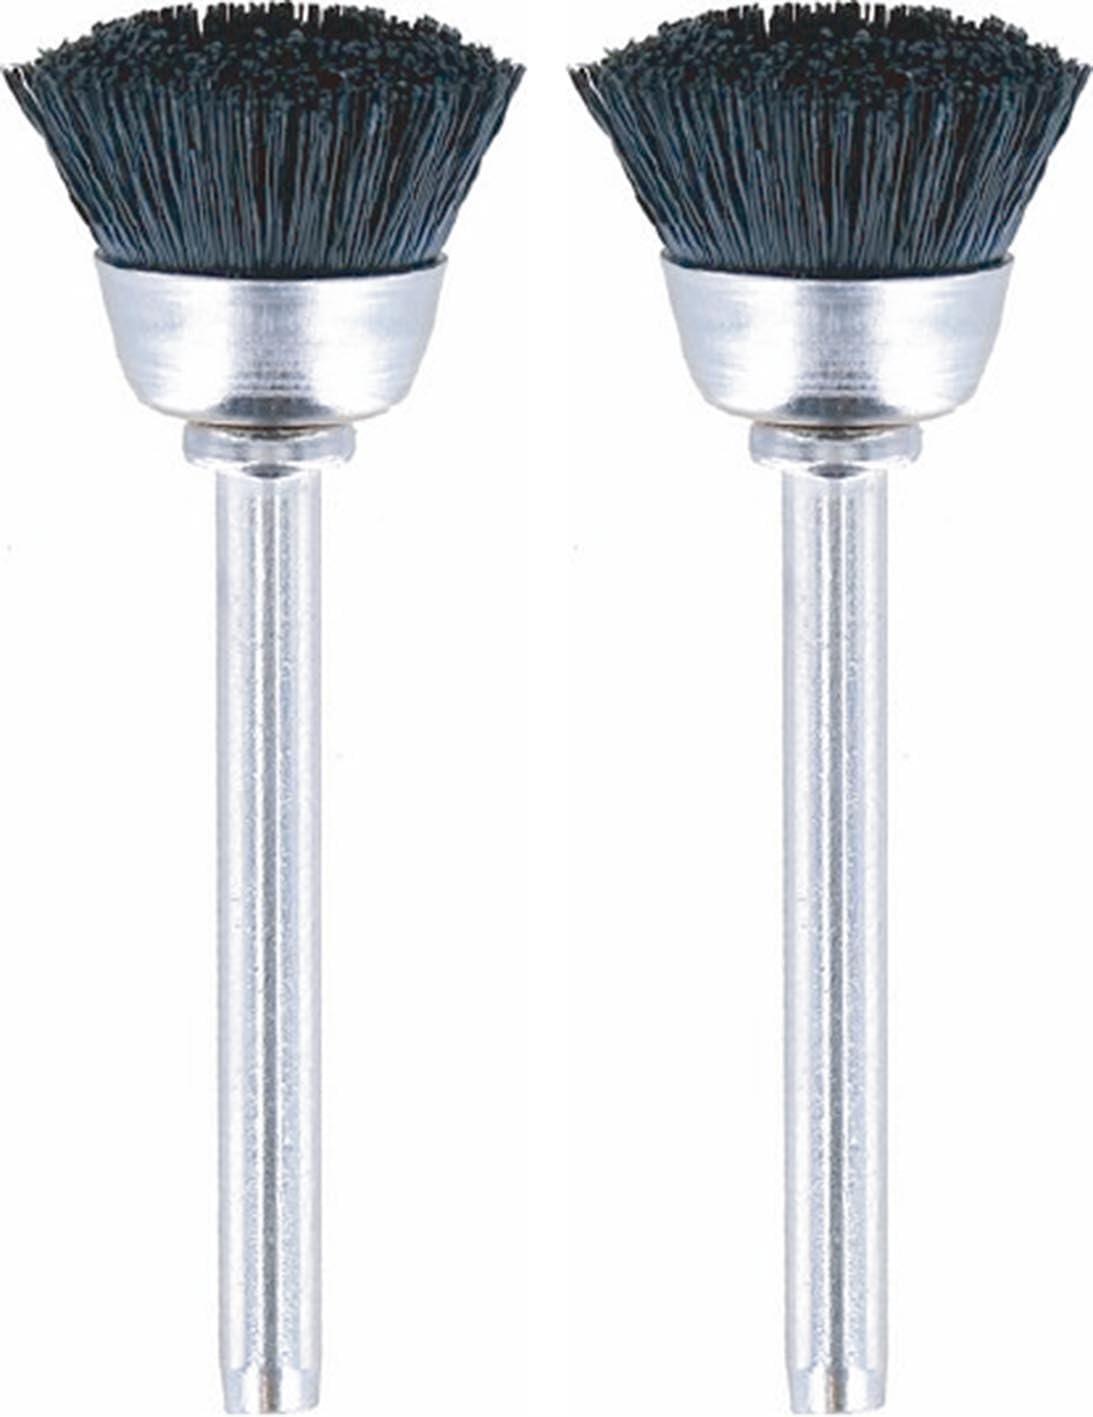 Dremel 404-02 Nylon Bristle Brushes (2 Pack), 1/2